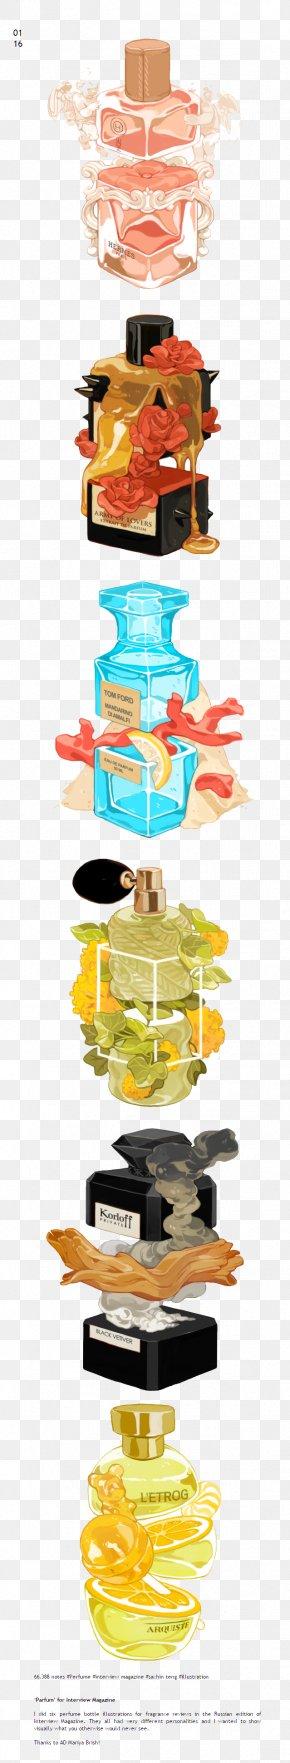 Perfume Bottle - Bottle Perfume Illustration PNG